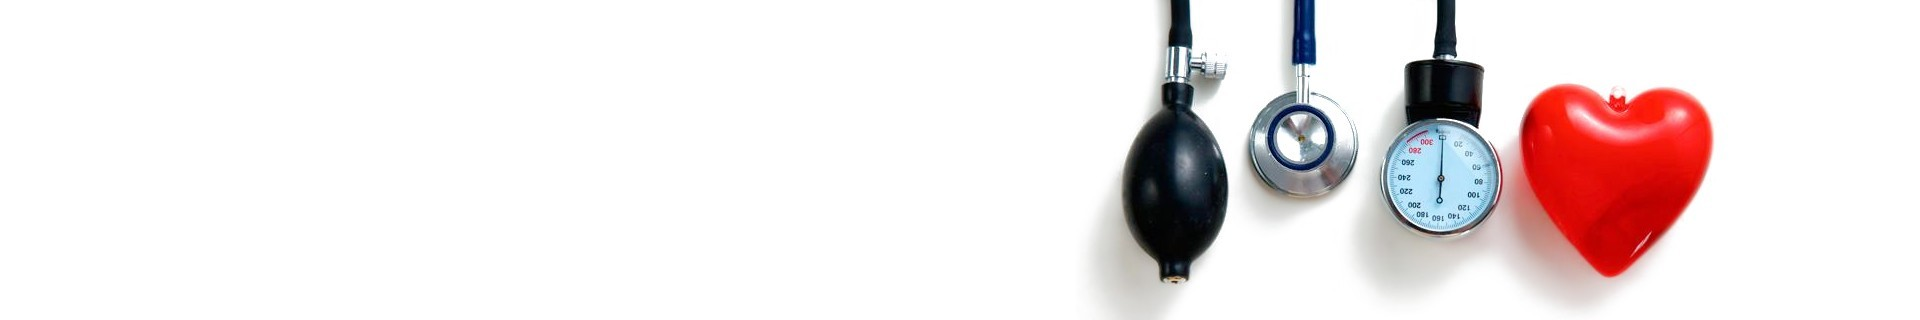 Tensiometre mecanice Riester, Moretti, Elecson, Honsun si Soho